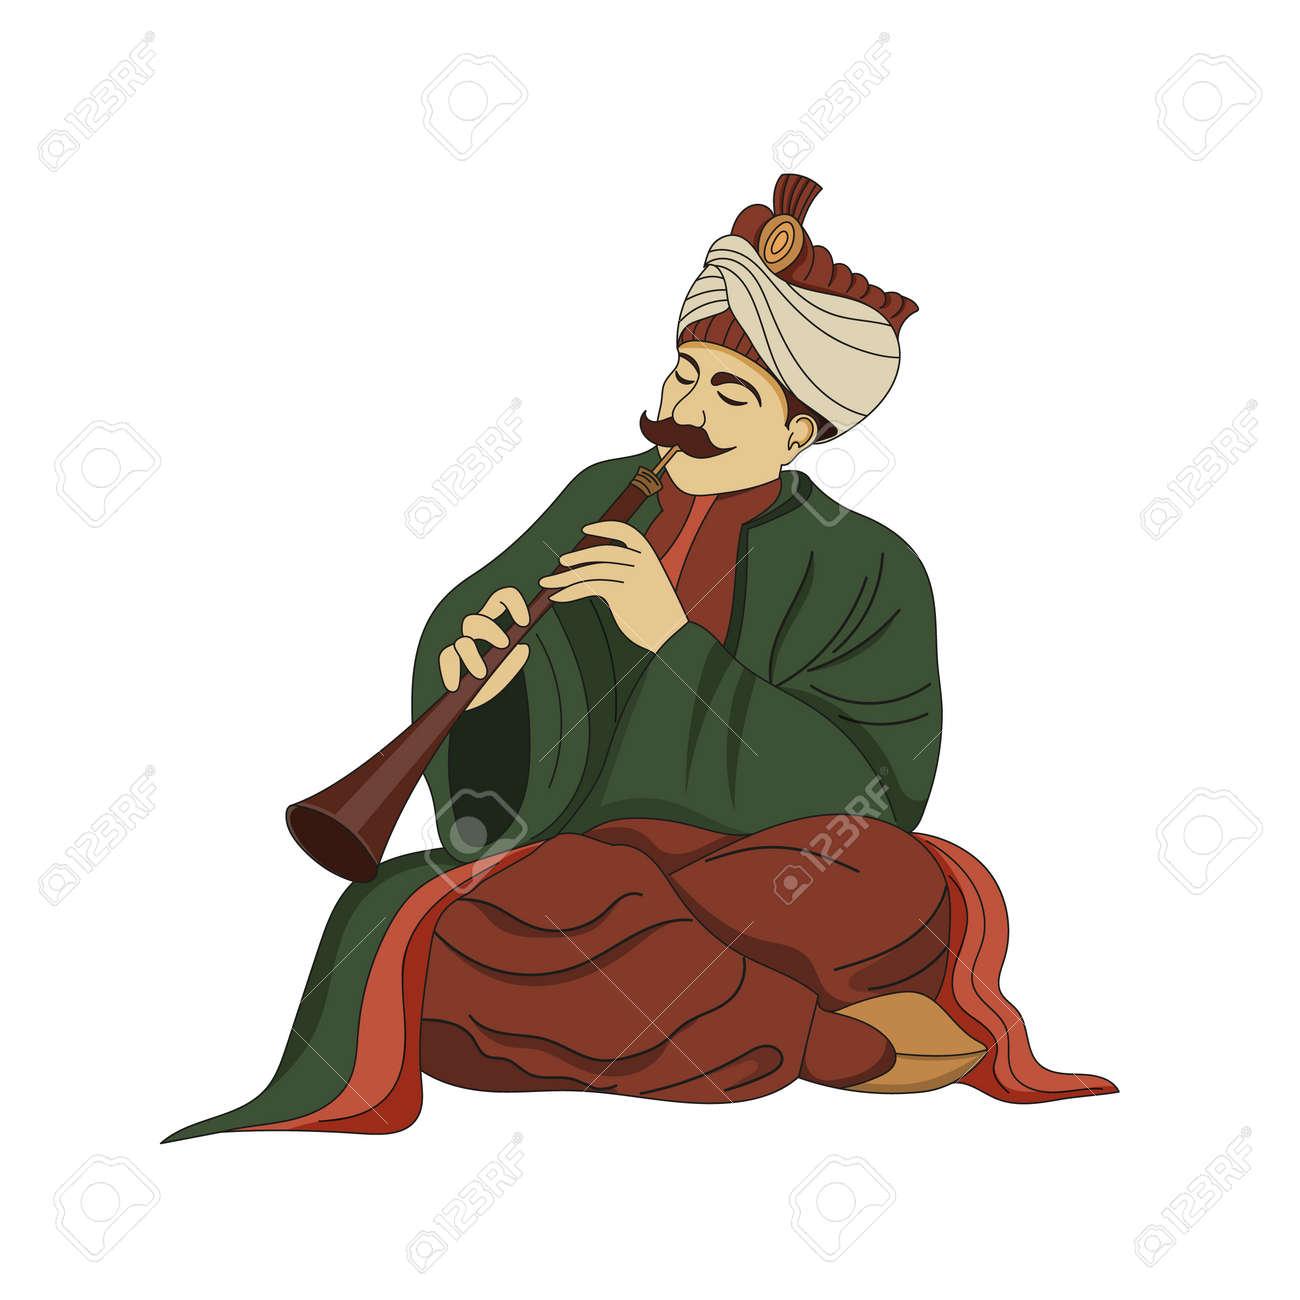 Traditional musician turkish man playing the zurna - 164037472